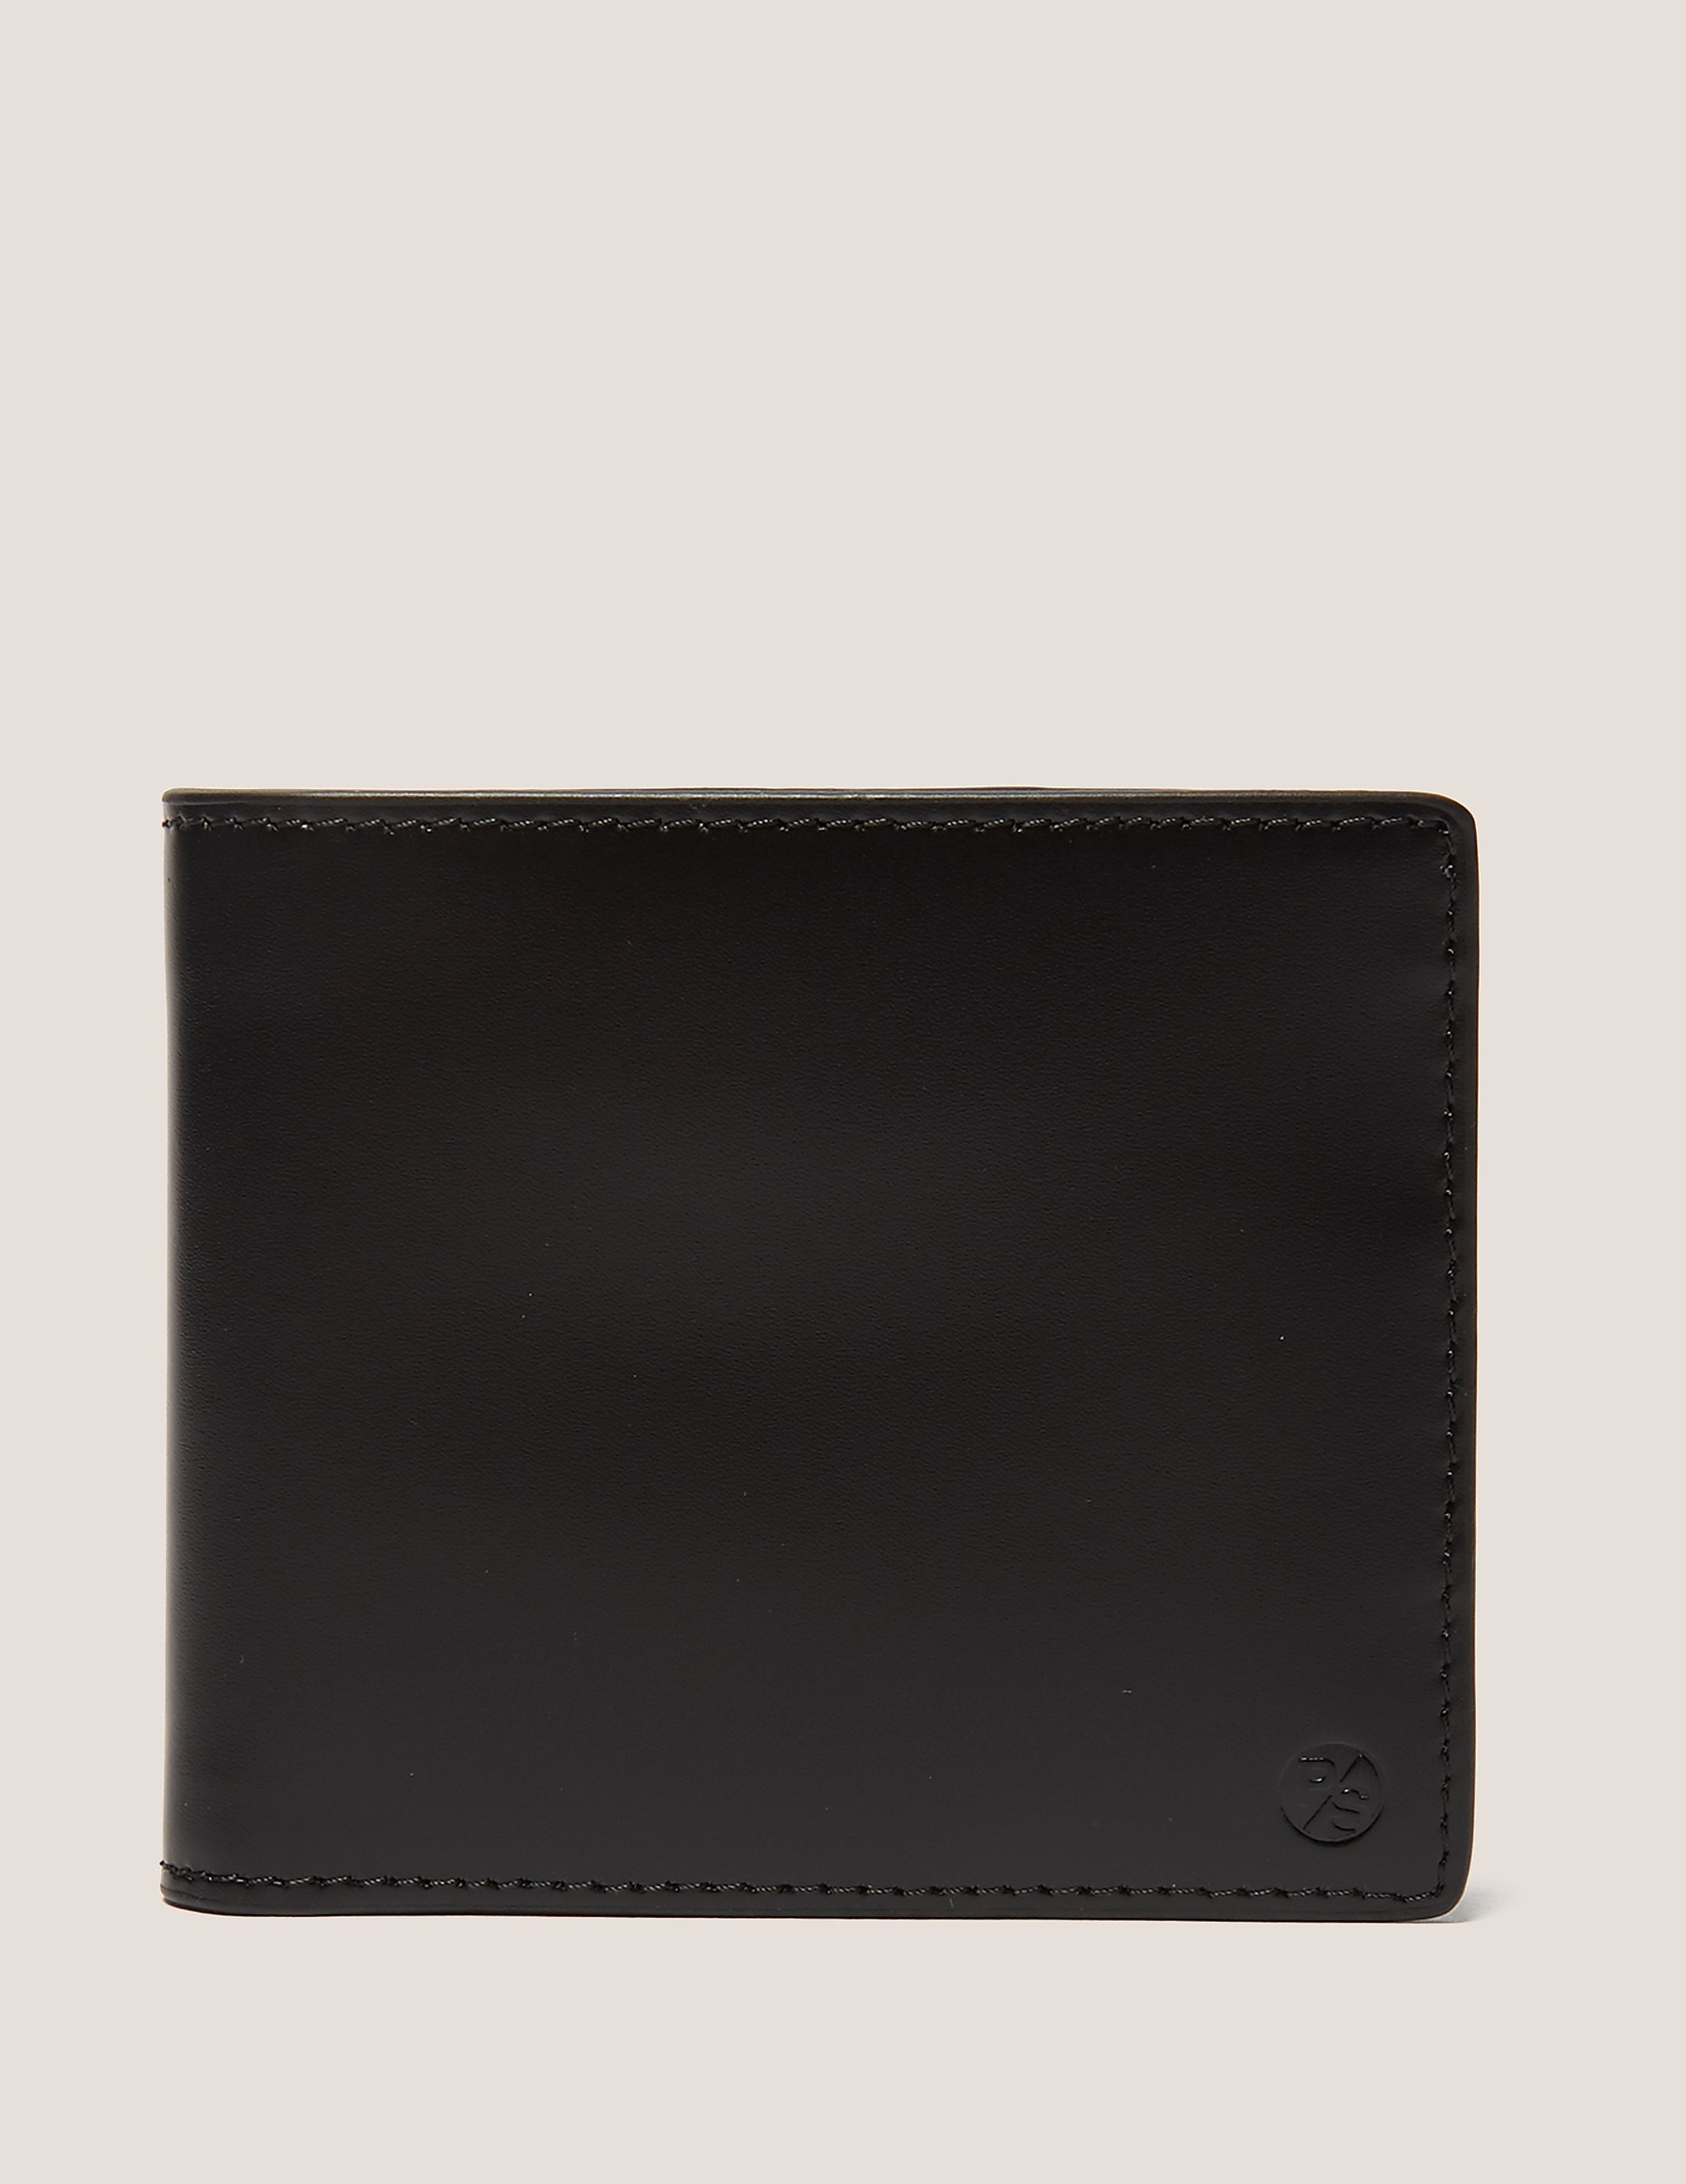 Paul Smith Cockatoo Billfold Wallet